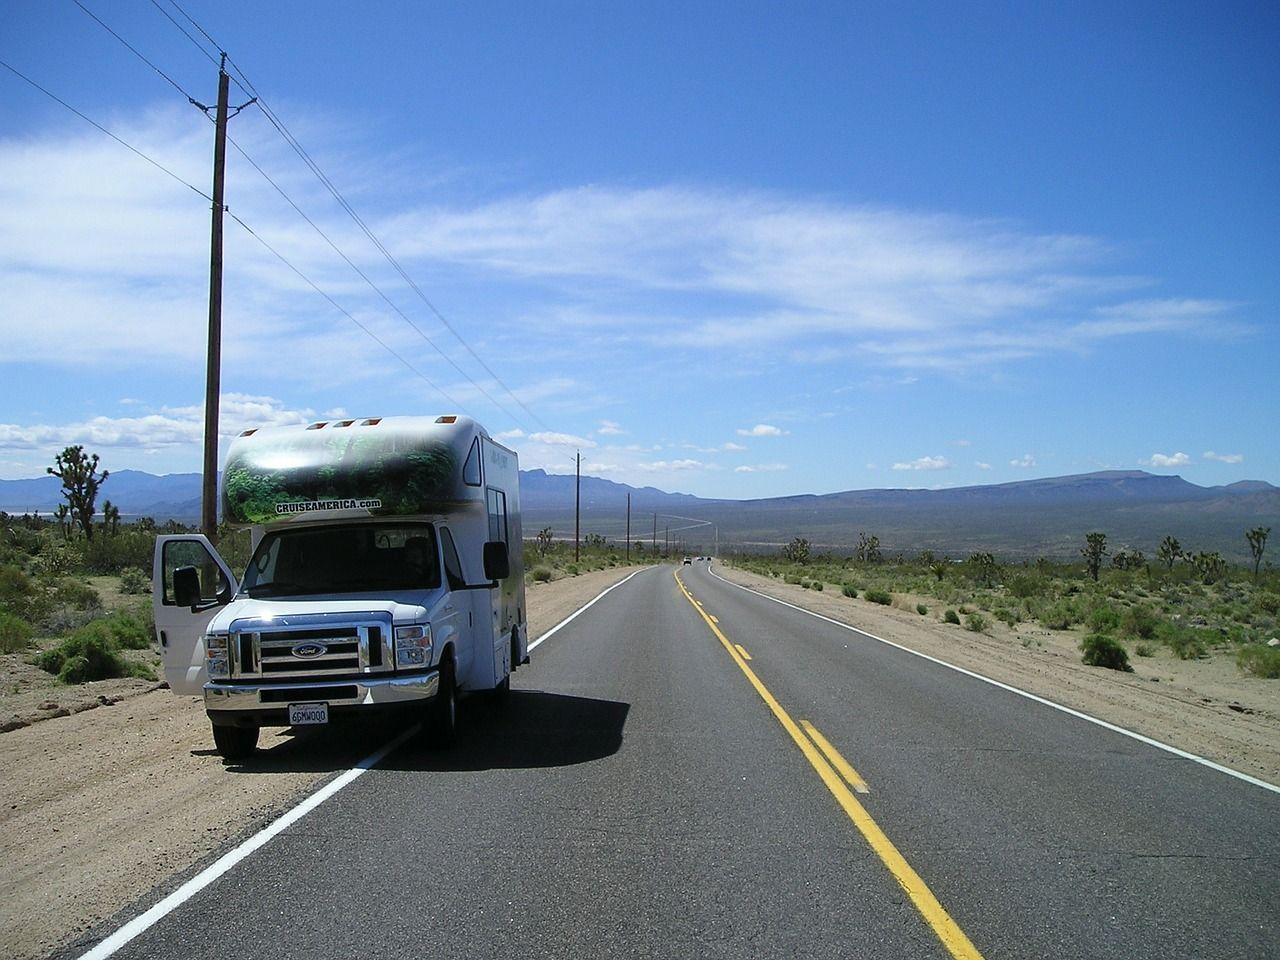 Vacation, Mobile Home Caravan Road Trip Travel Usa R